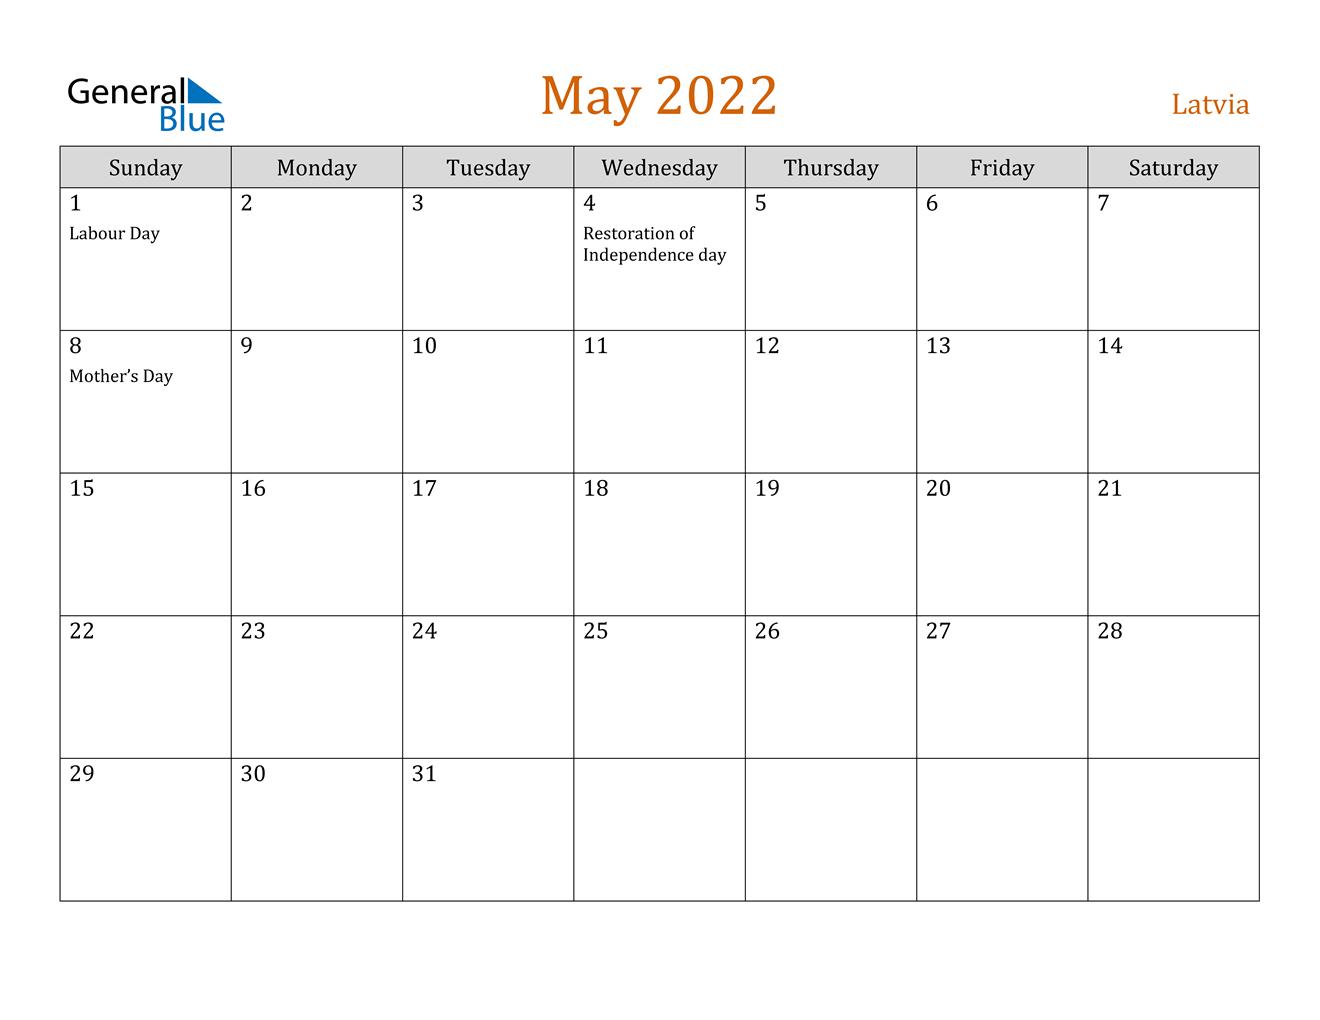 May 2022 Calendar - Latvia throughout Printable Calendar Month May 2022